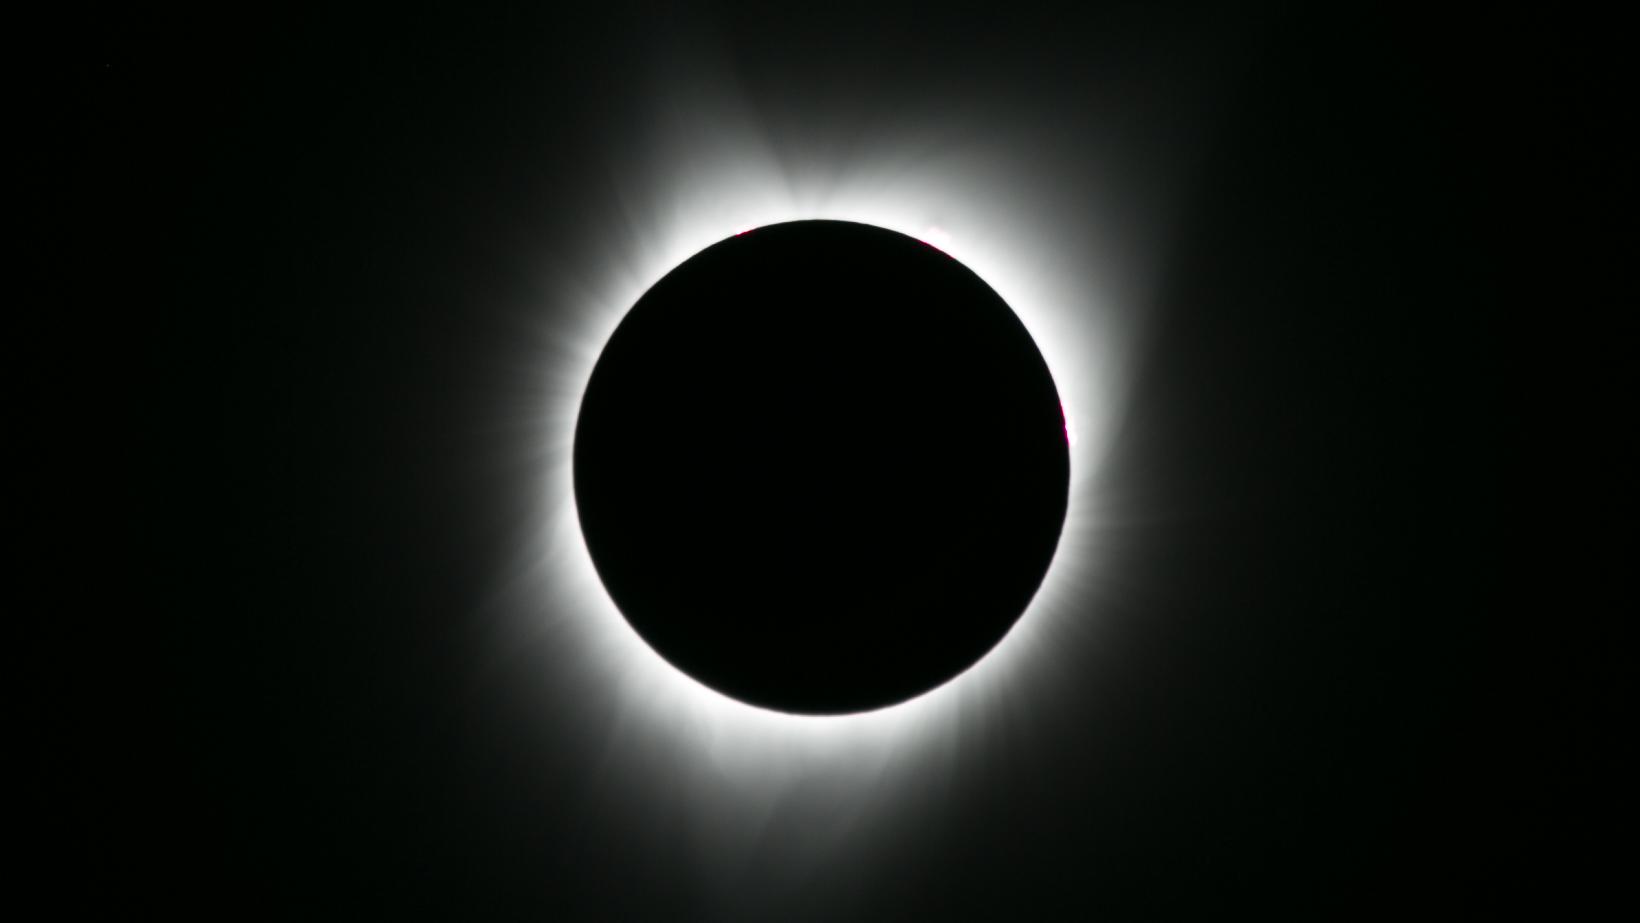 Eclipse_sford_08-21-17-248.jpg